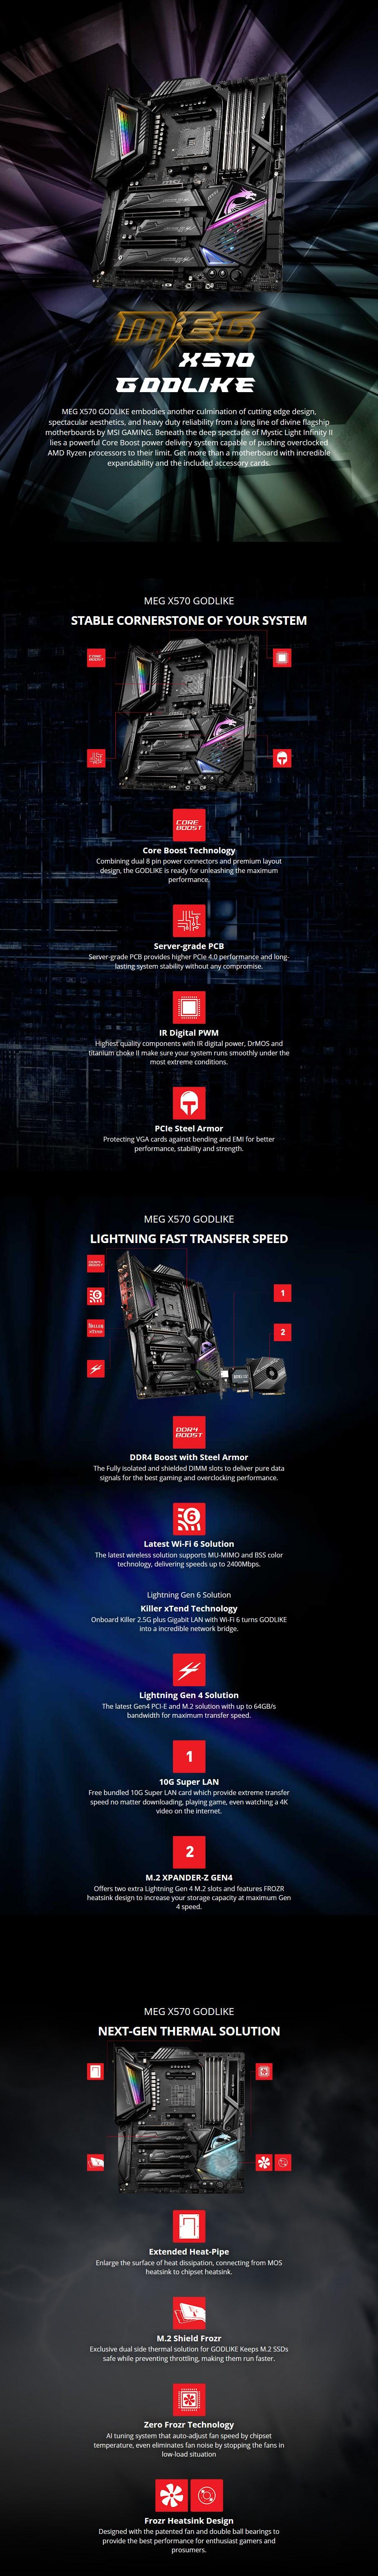 MSI MEG X570 GODLIKE AM4 E-ATX Motherboard - Overview 1